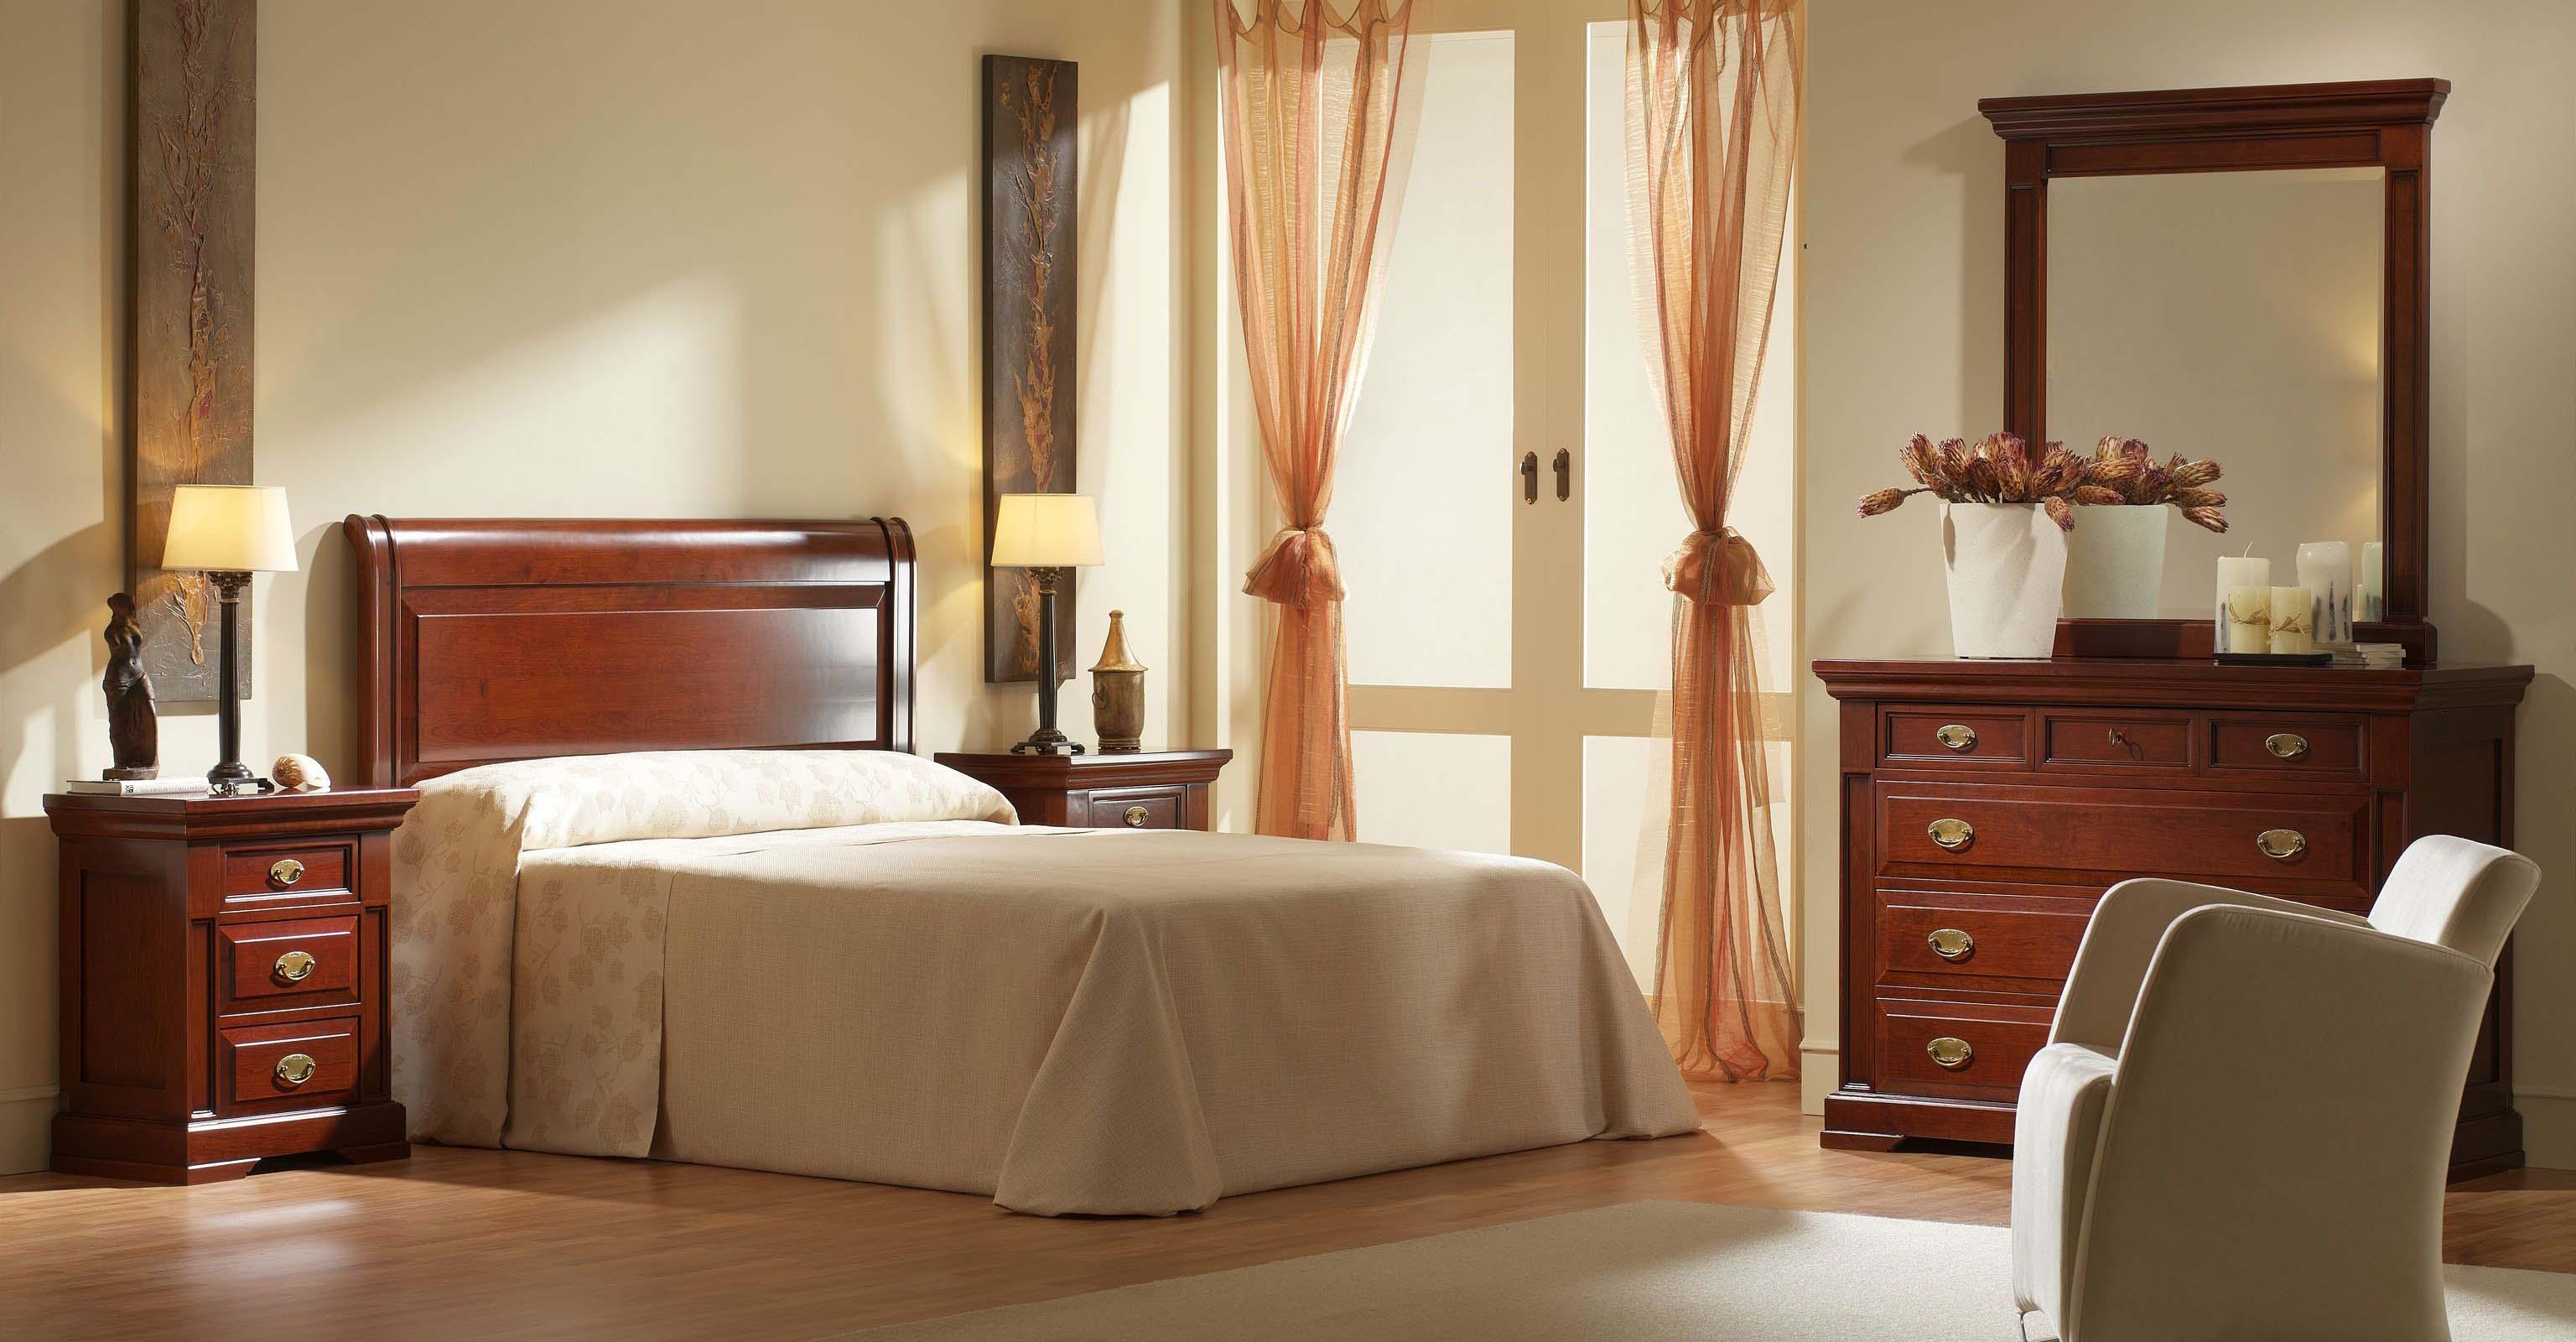 dormitorios de matrimonio de estilo clasico (41)